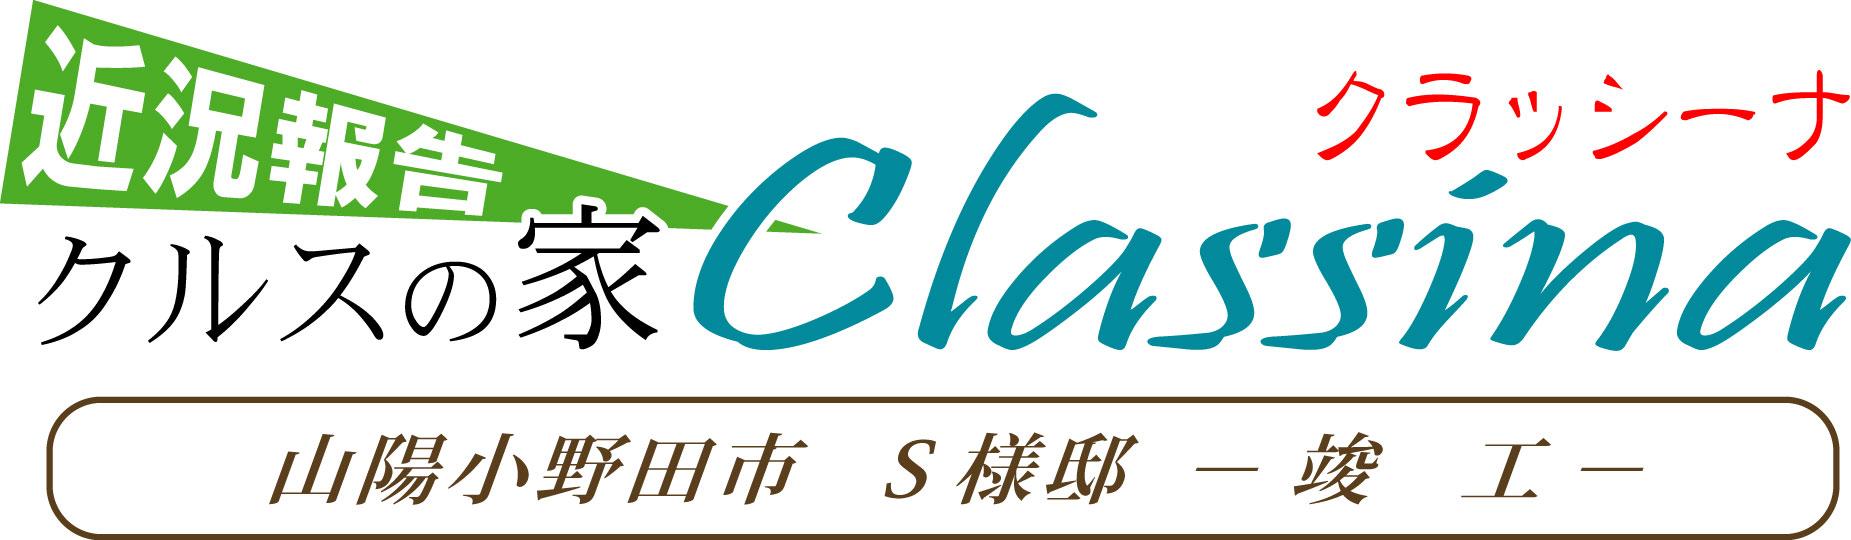 KuraSi-natu-sin73-02.jpg